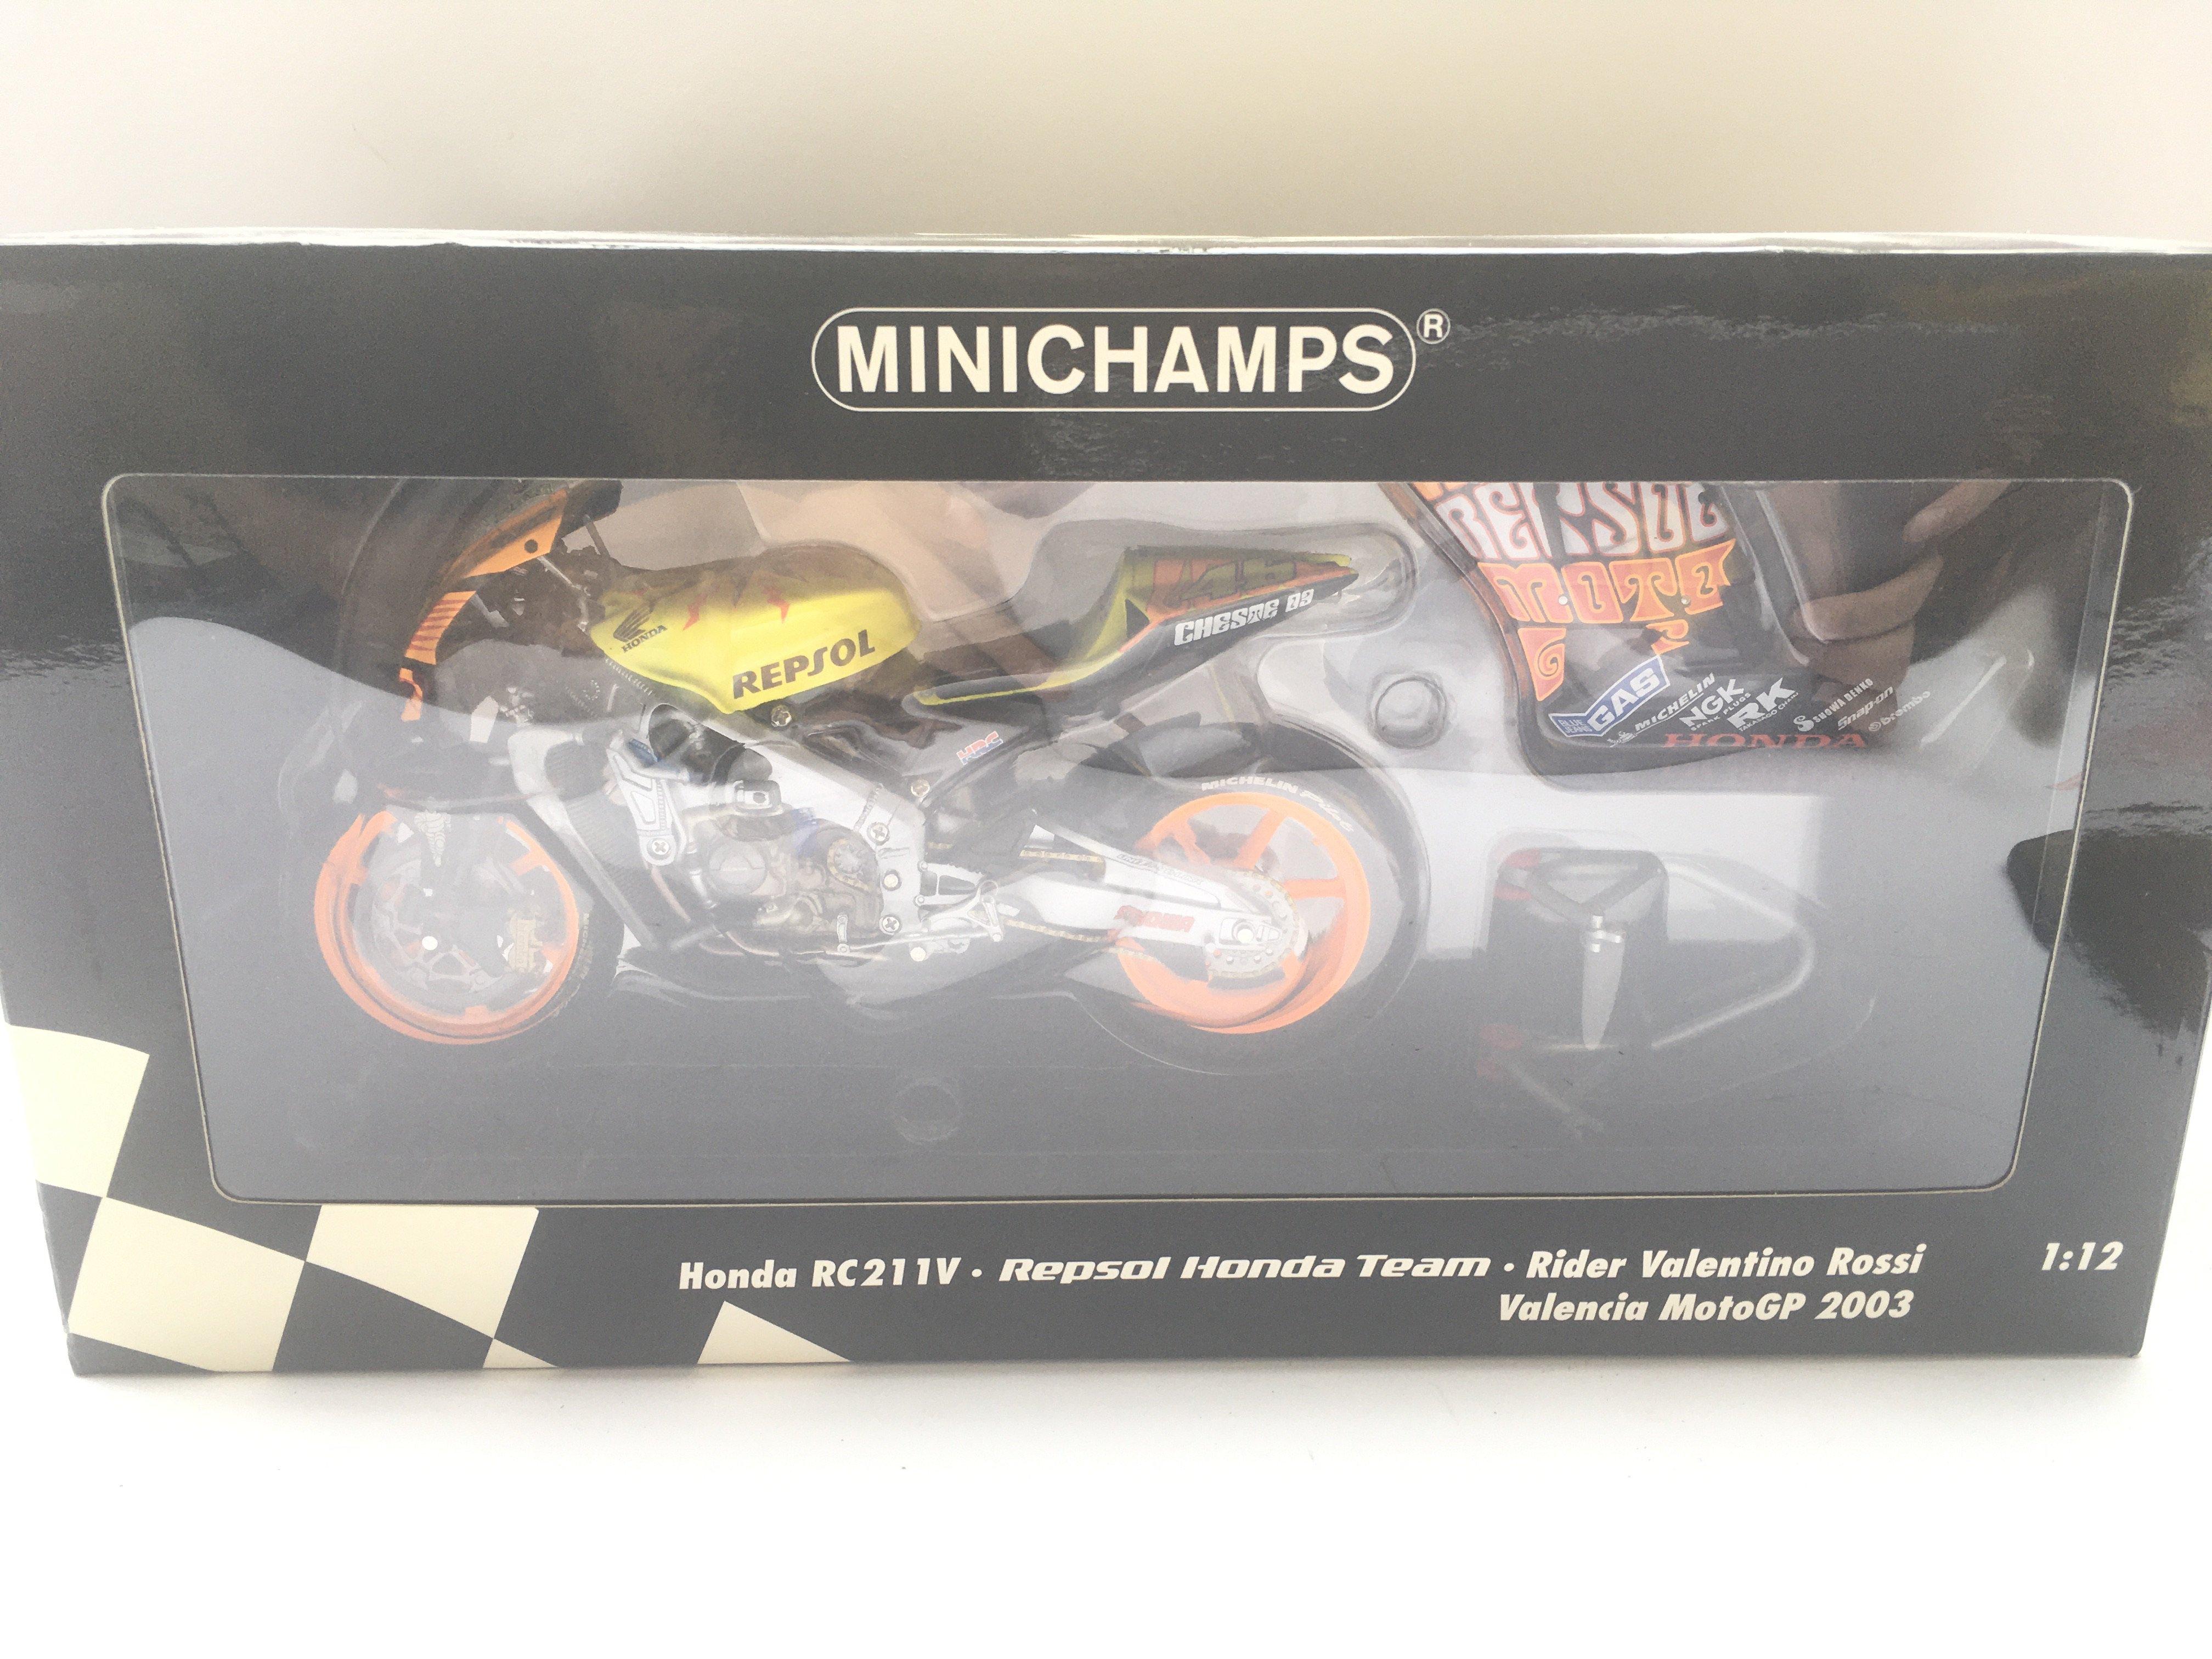 A Minichamps Honda RC211V. Repsol Honda Team. Vale